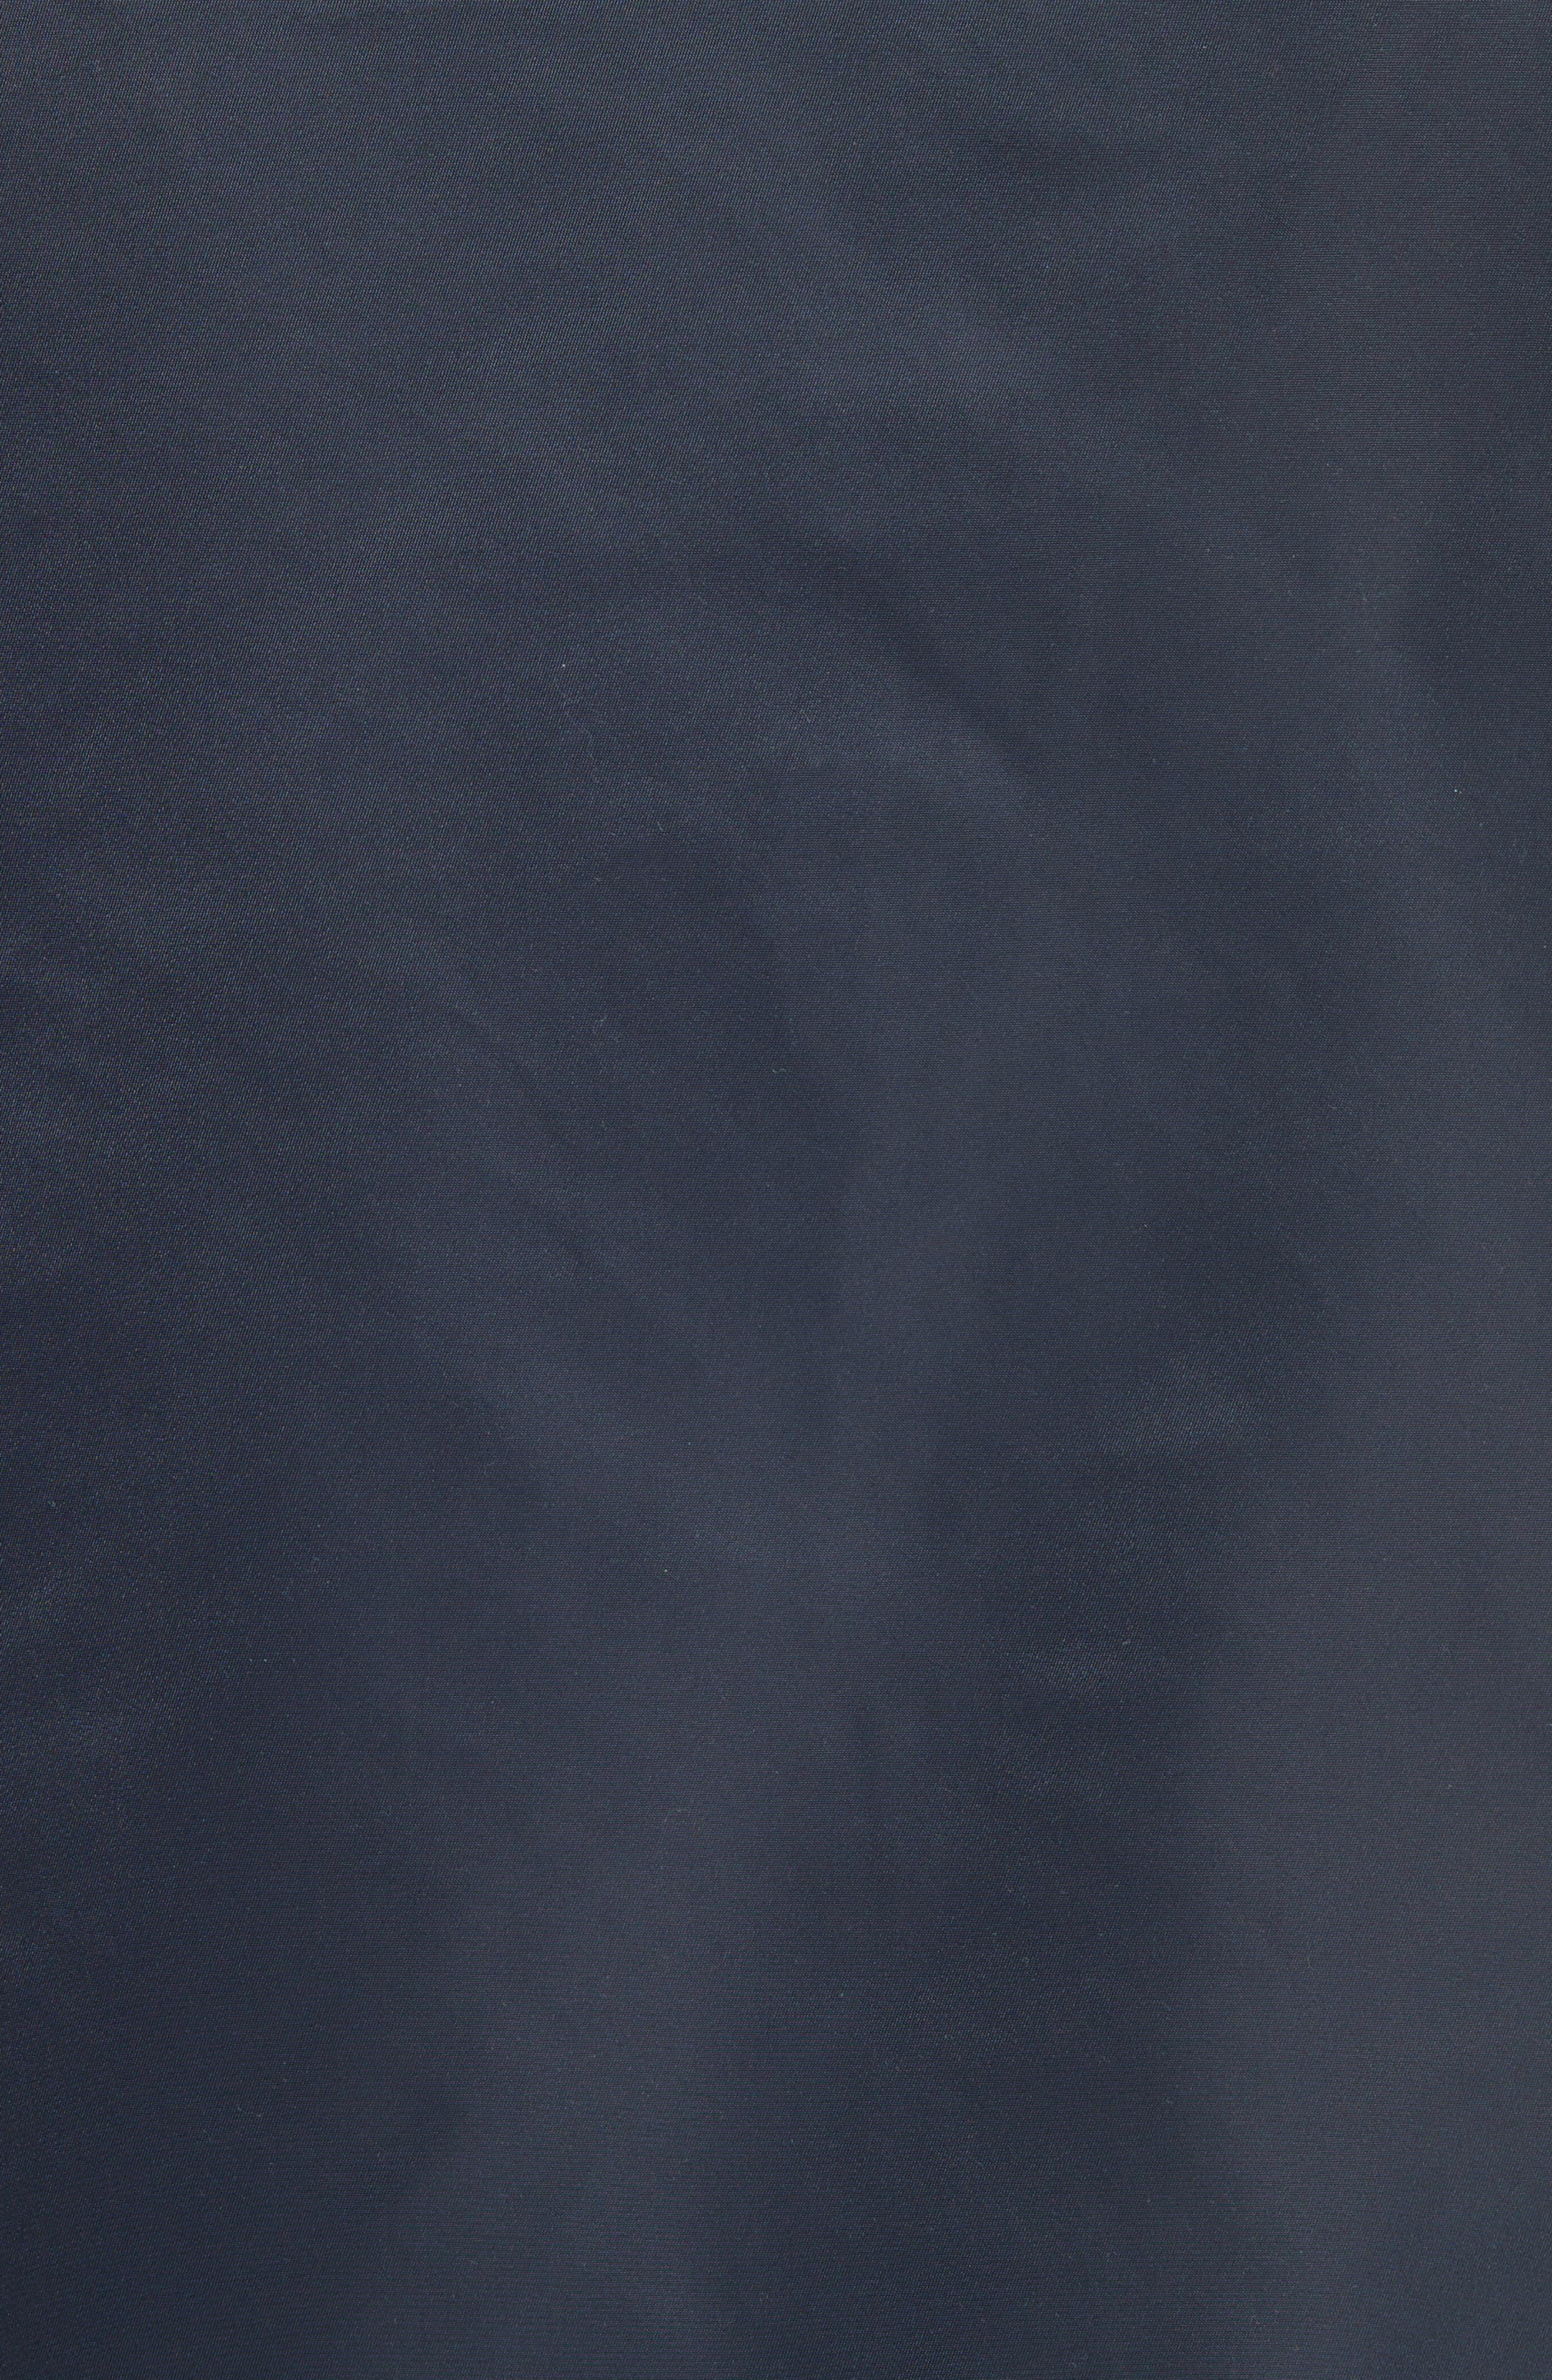 Nylon Bomber Jacket,                             Alternate thumbnail 5, color,                             Midnight Blue